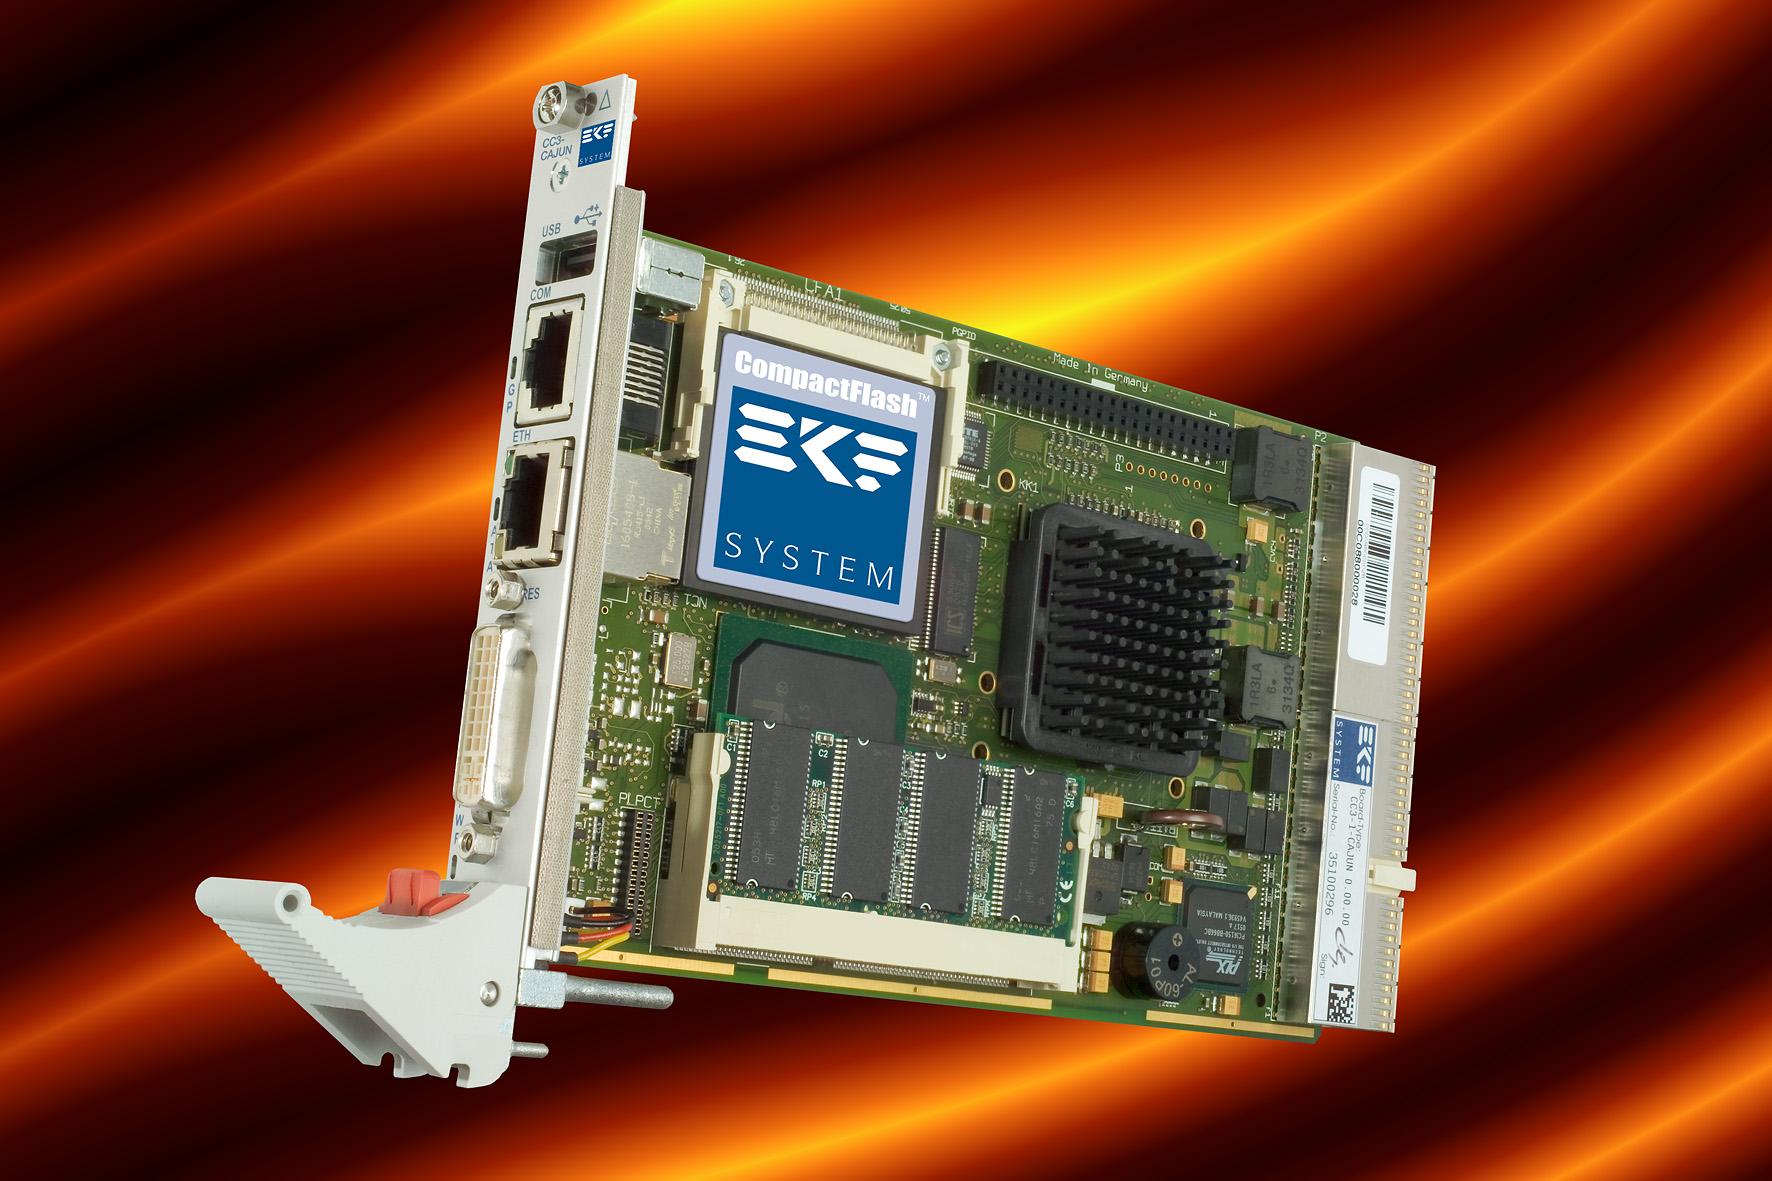 Ekf Compactpci Cpu Boards Cc3 Cajun Ulv Celeron Lv Pentium Iii 3 Block Diagram Pdf 1 2